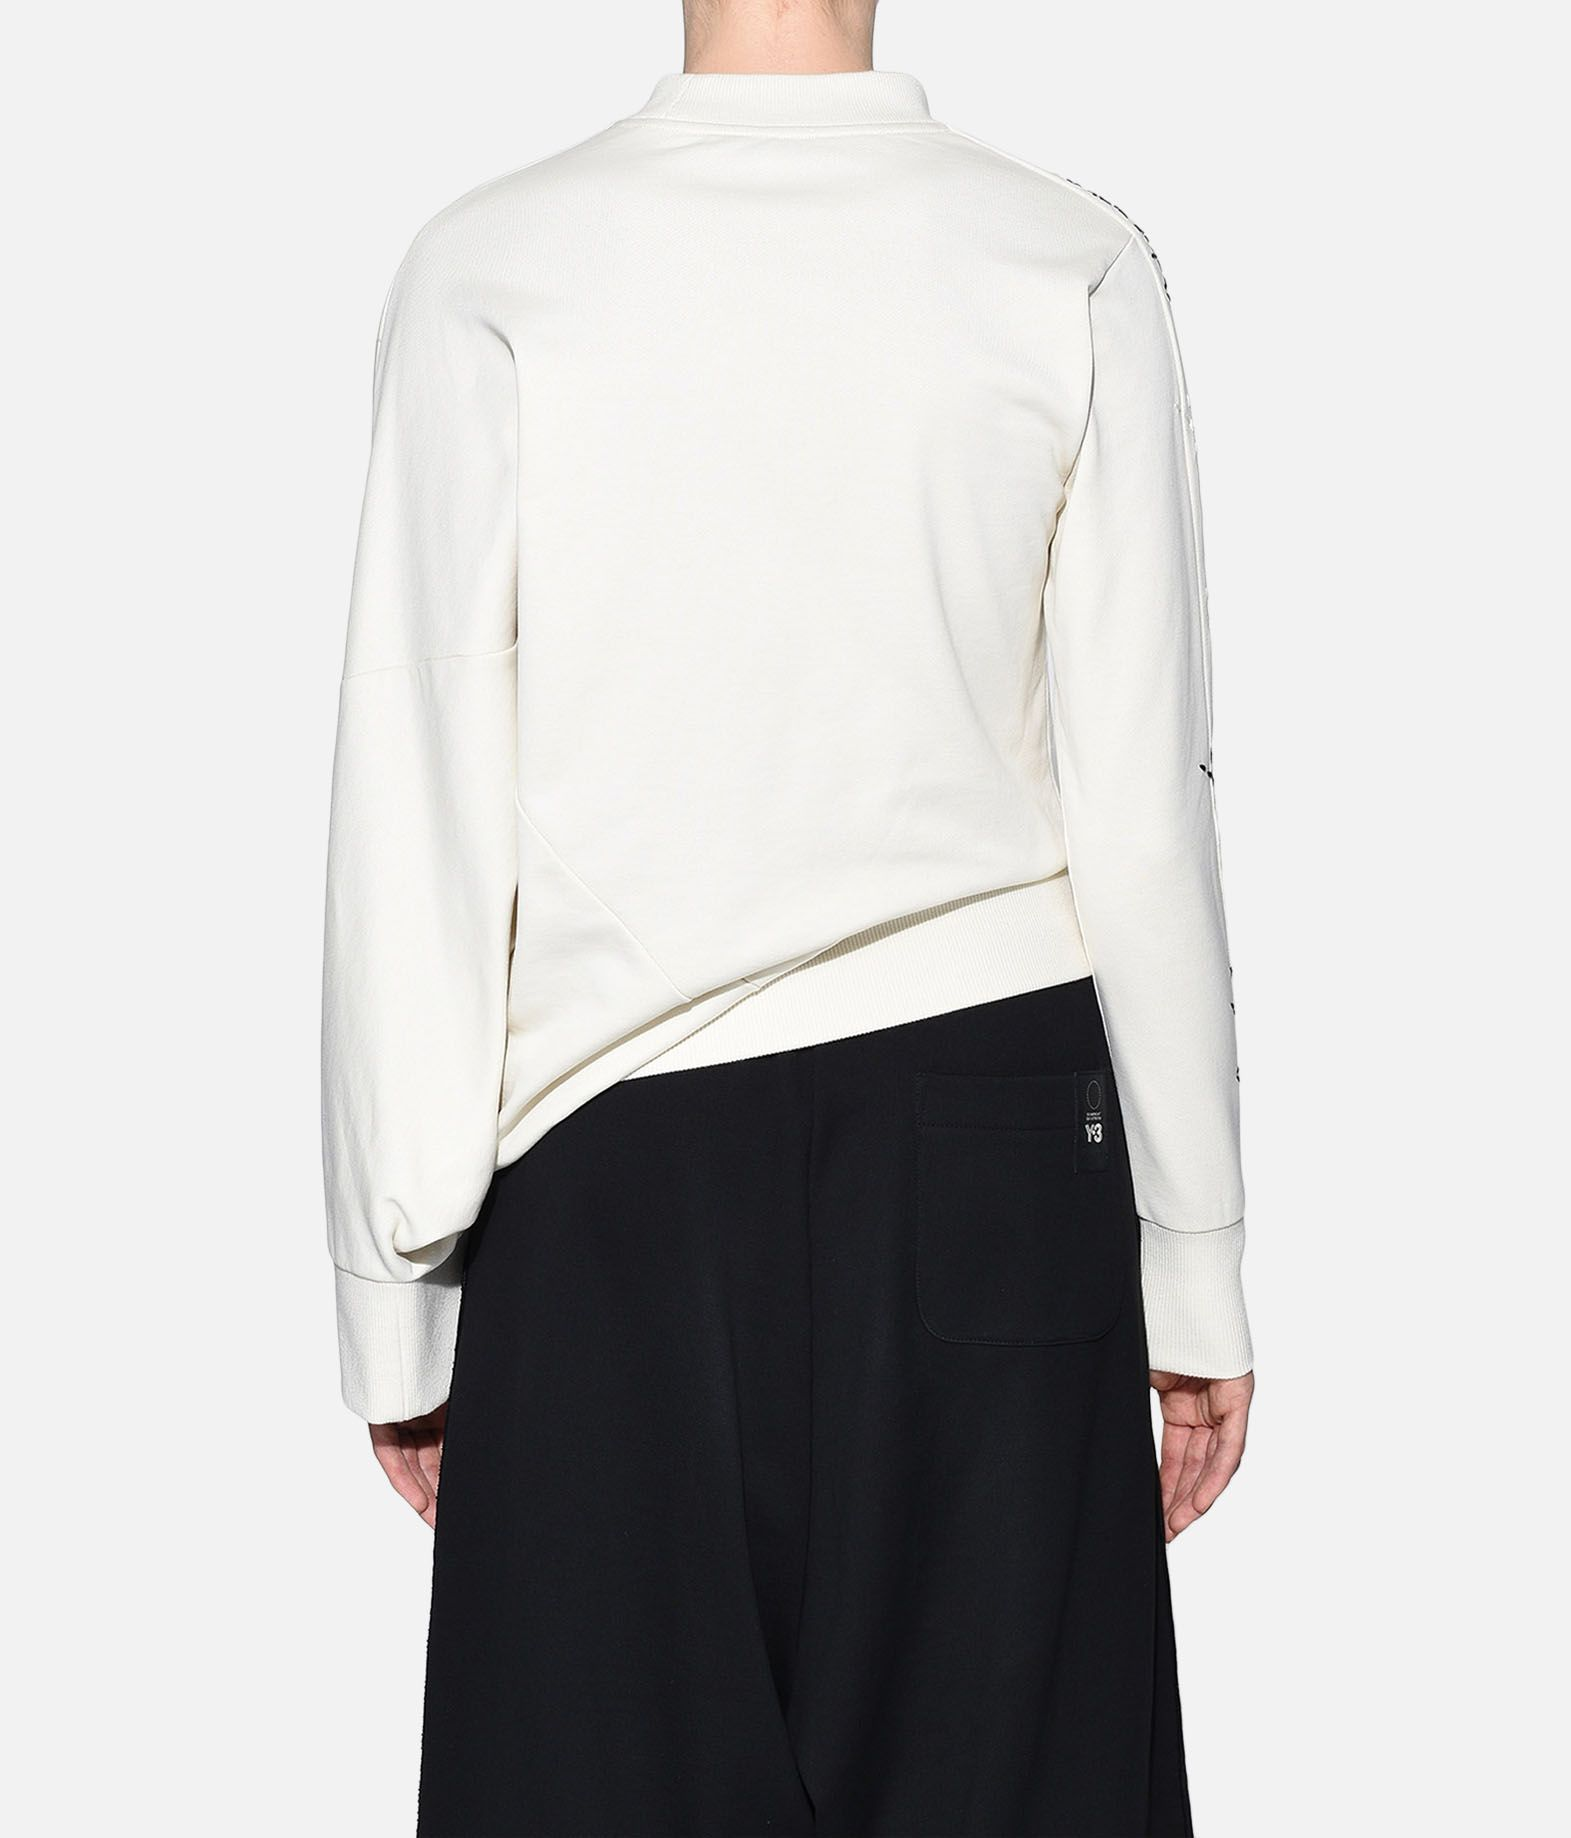 Y-3 Y-3 Sashiko Slogan Sweater Толстовка Для Женщин d